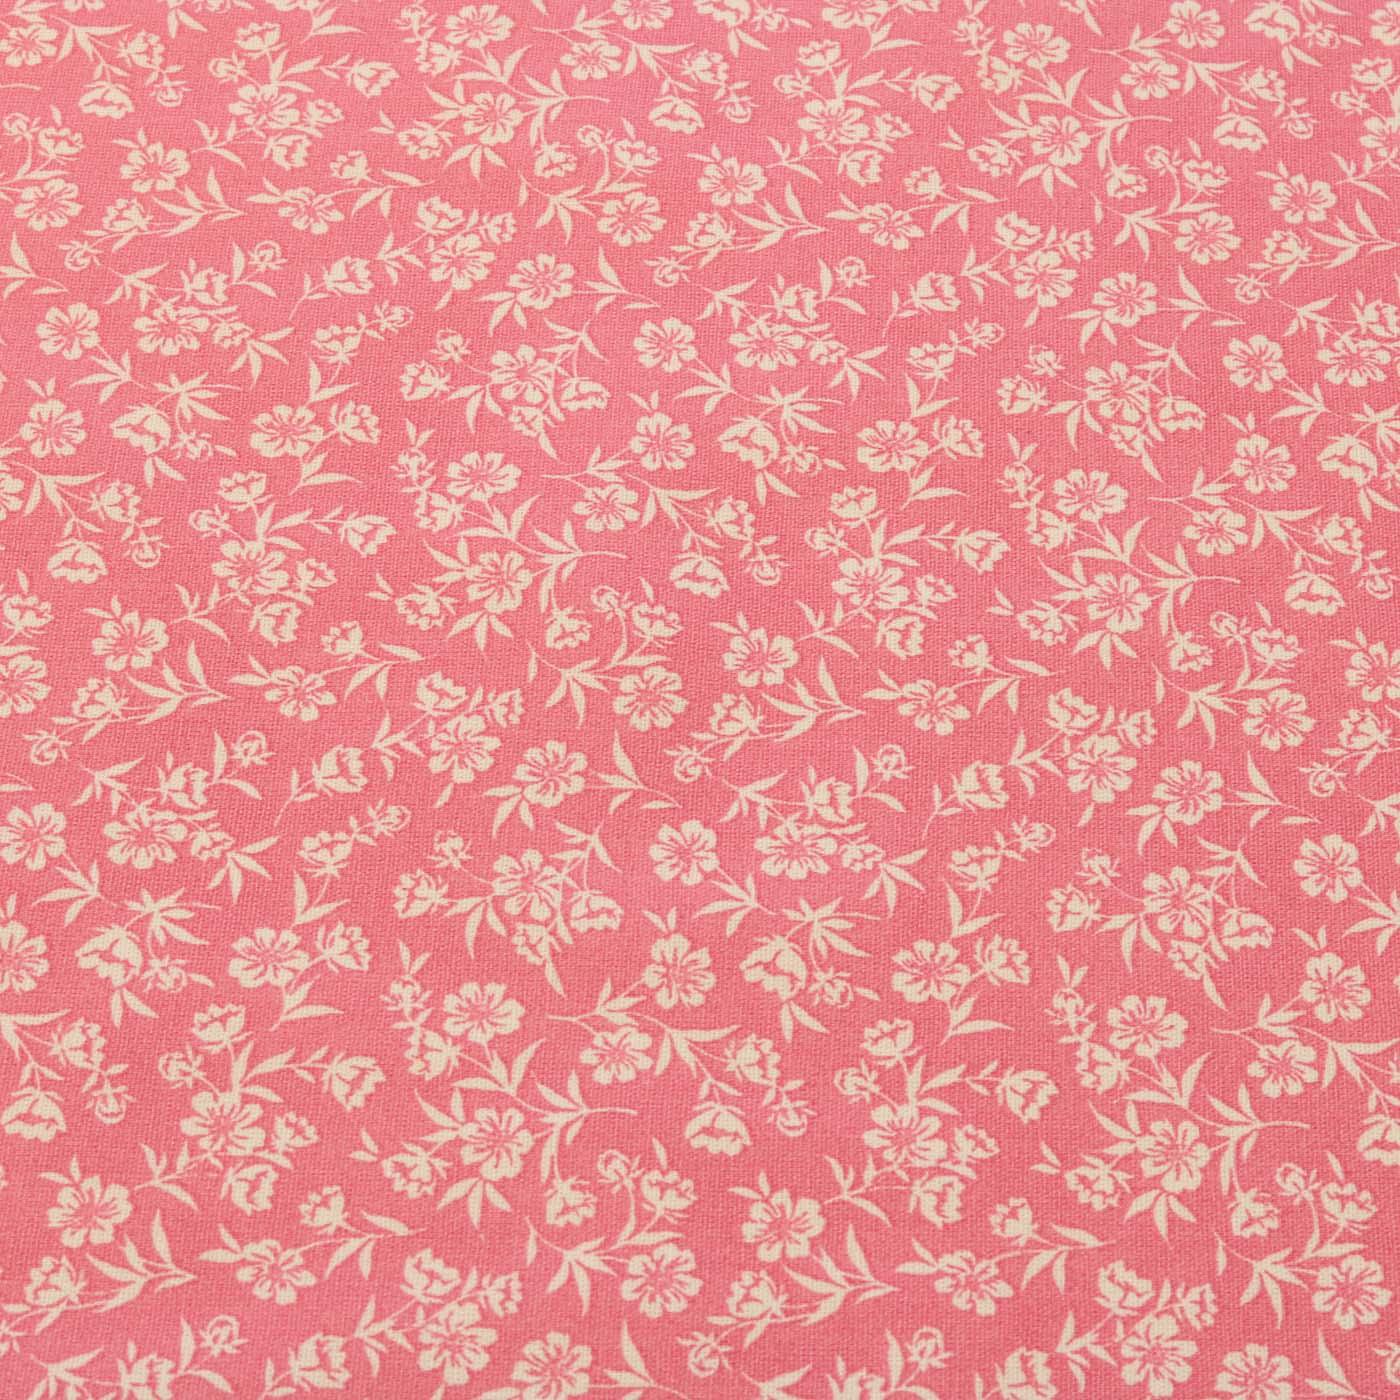 Tecido Tricoline Estampado Patchwork Floral Rosa Chiclete